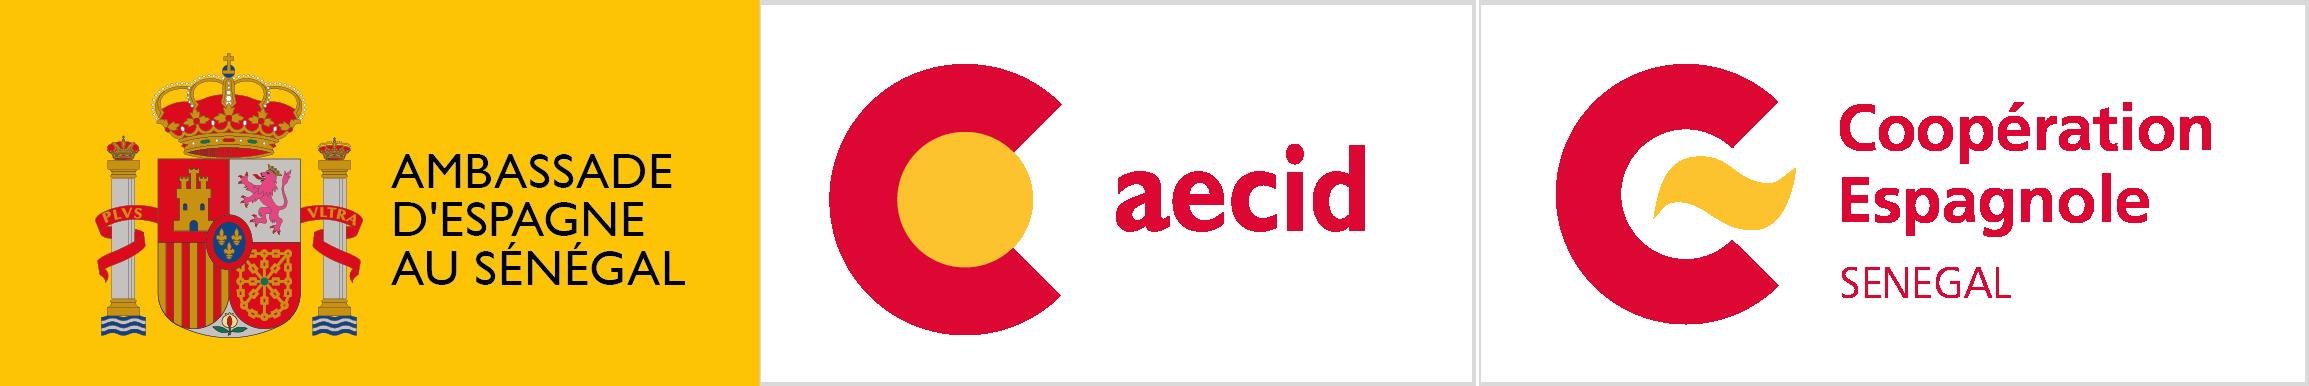 Logo EMB AECID CE SENEGAL